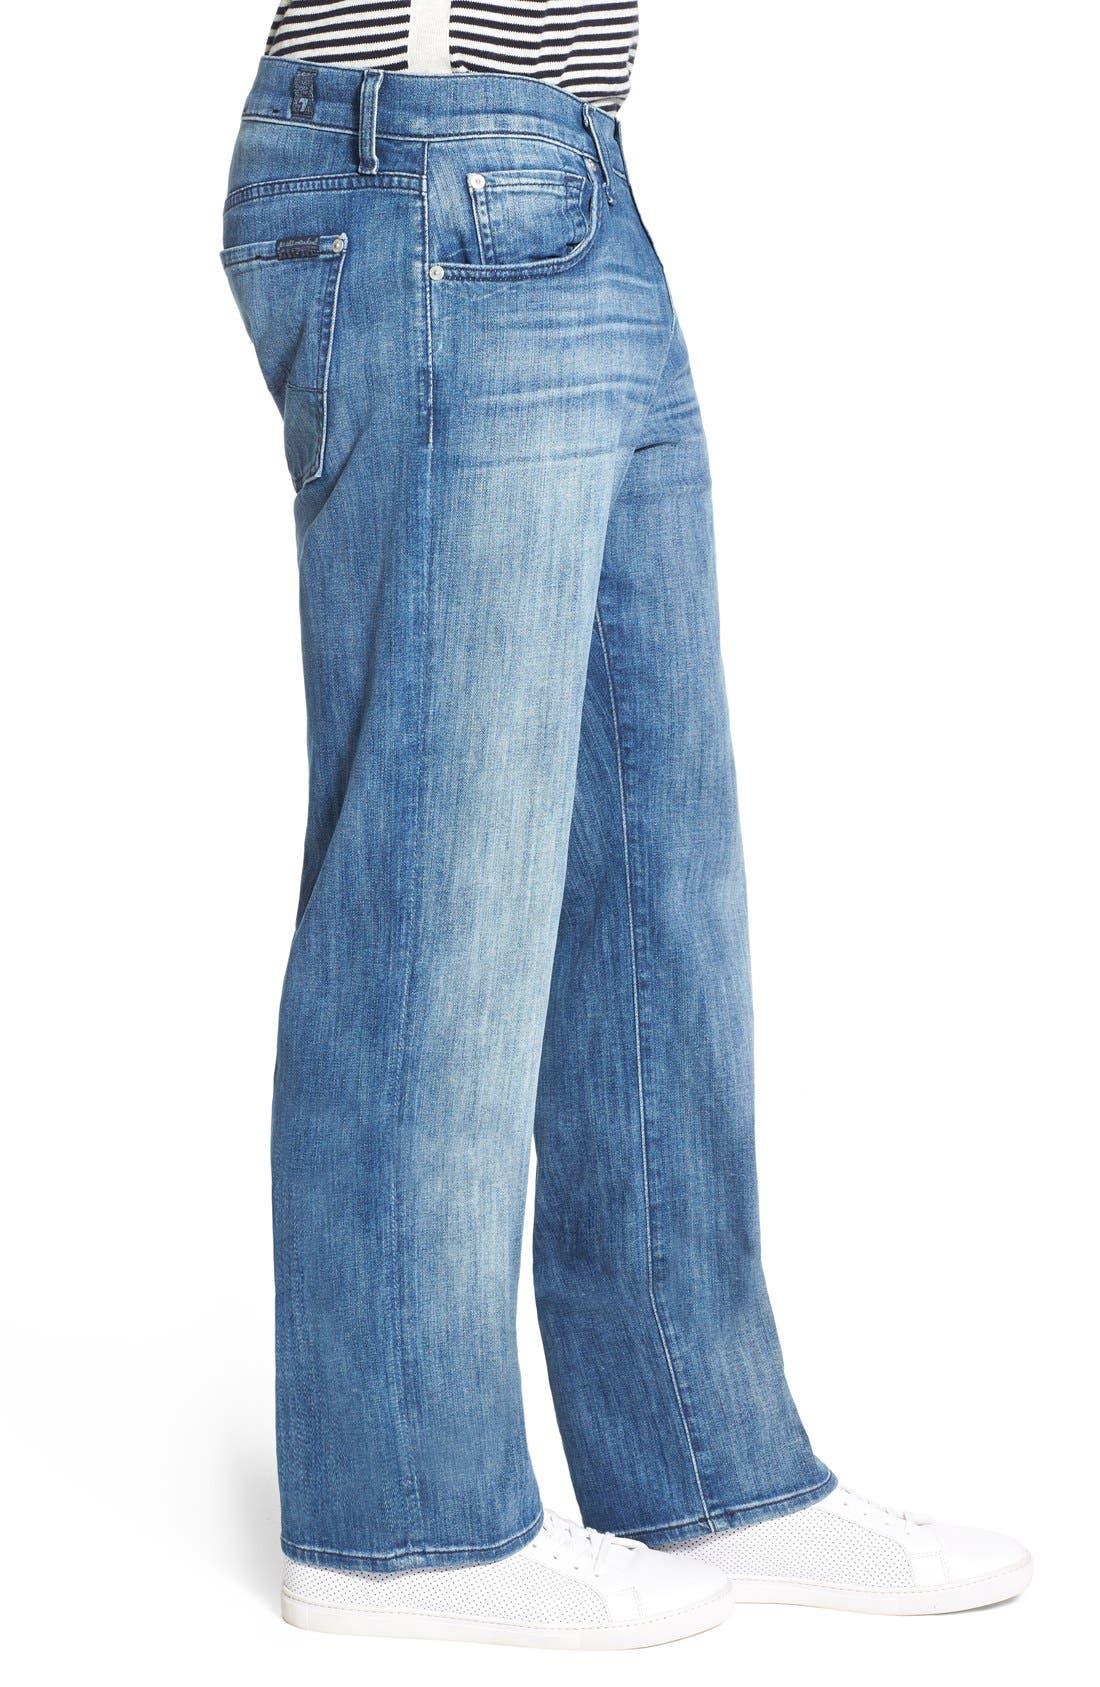 Luxe Performance - Austyn Relaxed Straight Leg Jeans,                             Alternate thumbnail 3, color,                             NAKKITTA BLUE